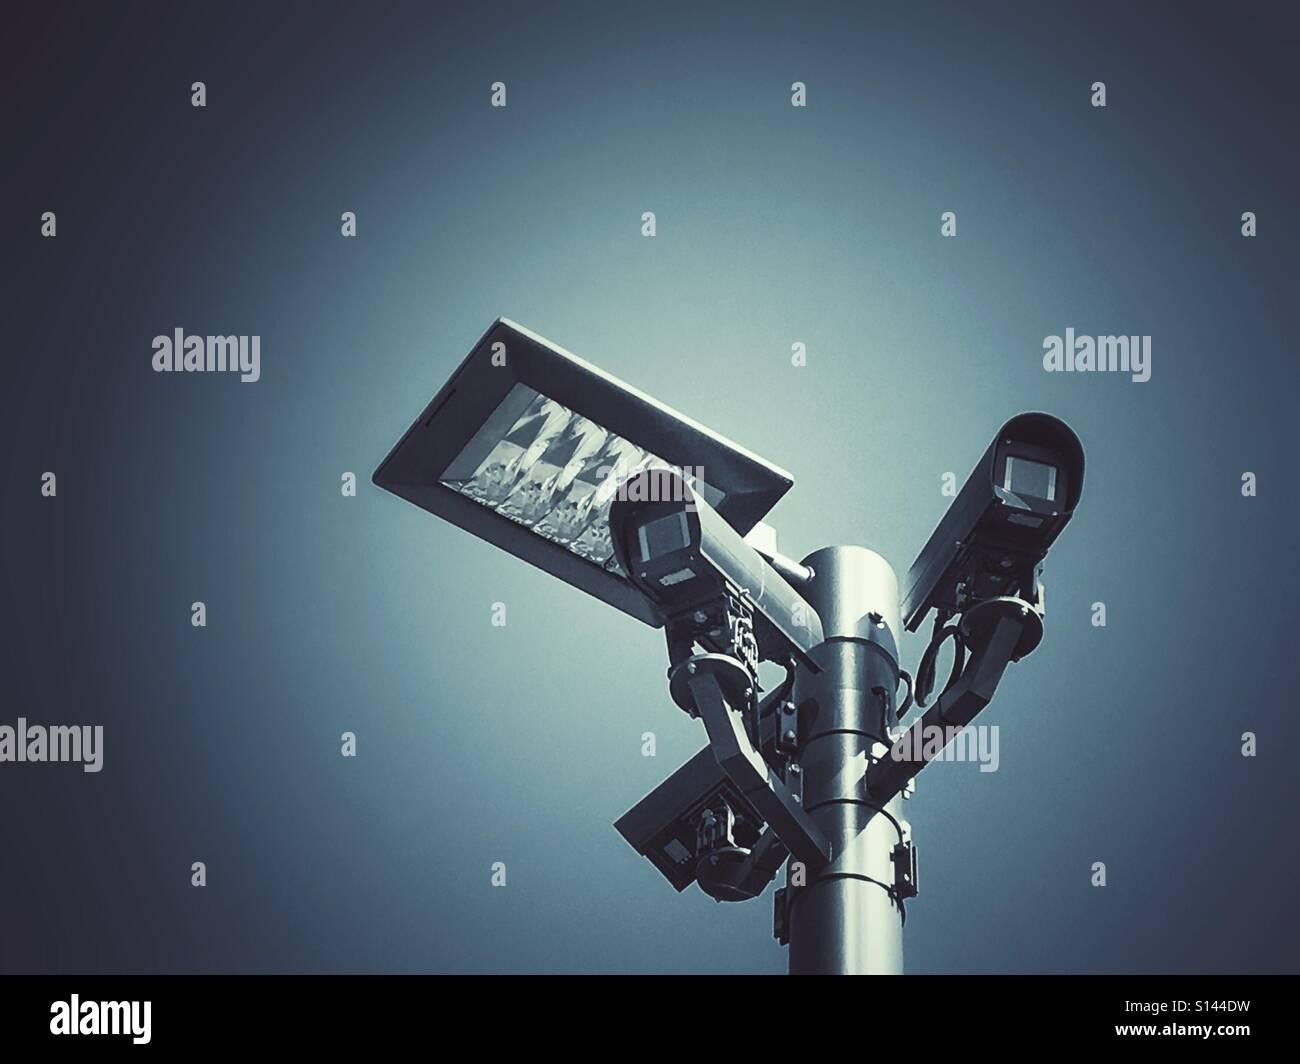 Surveillance cameras in Hamburg, Germany. - Stock Image